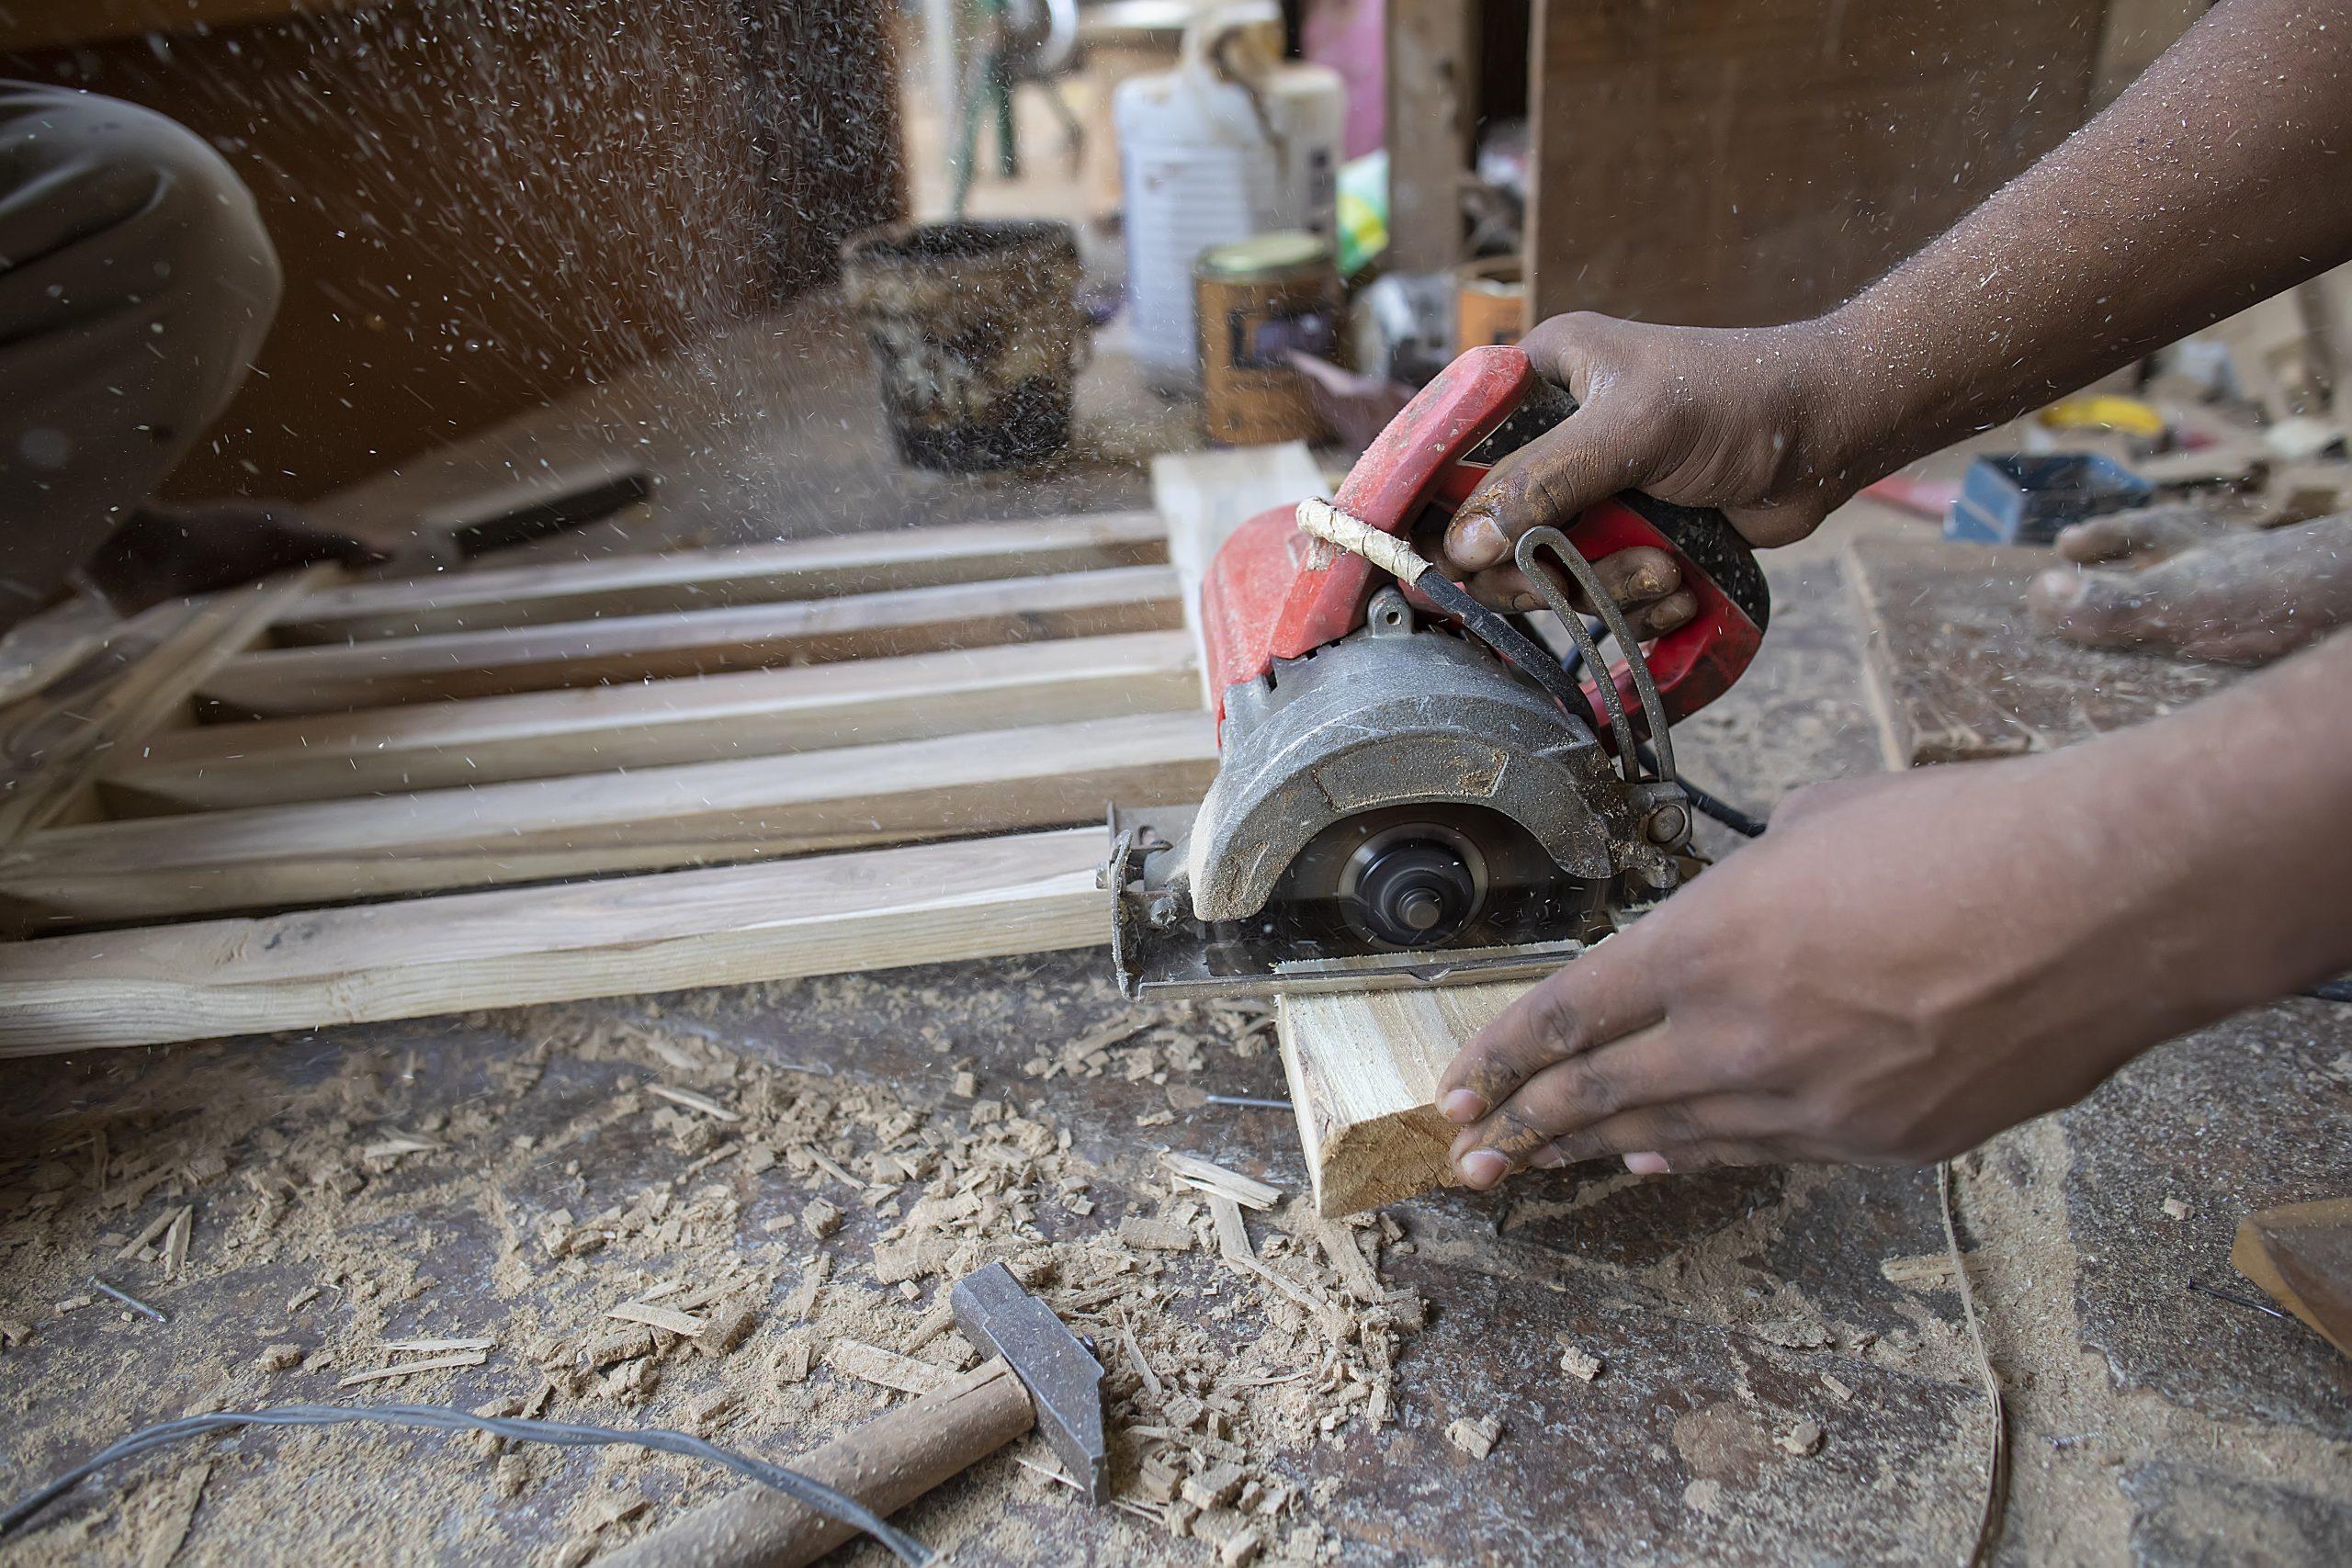 A carpenter's work